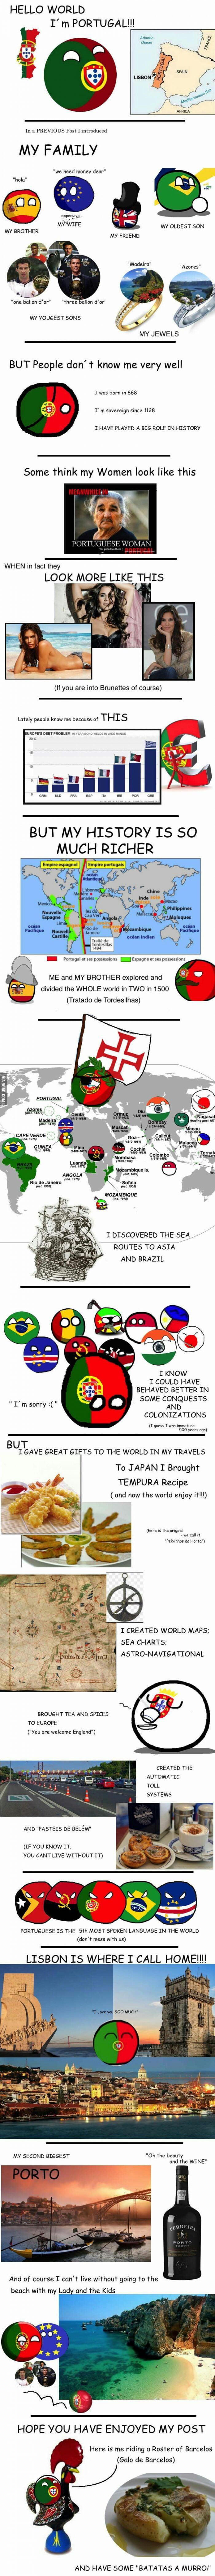 Meet my country, I hope you like it